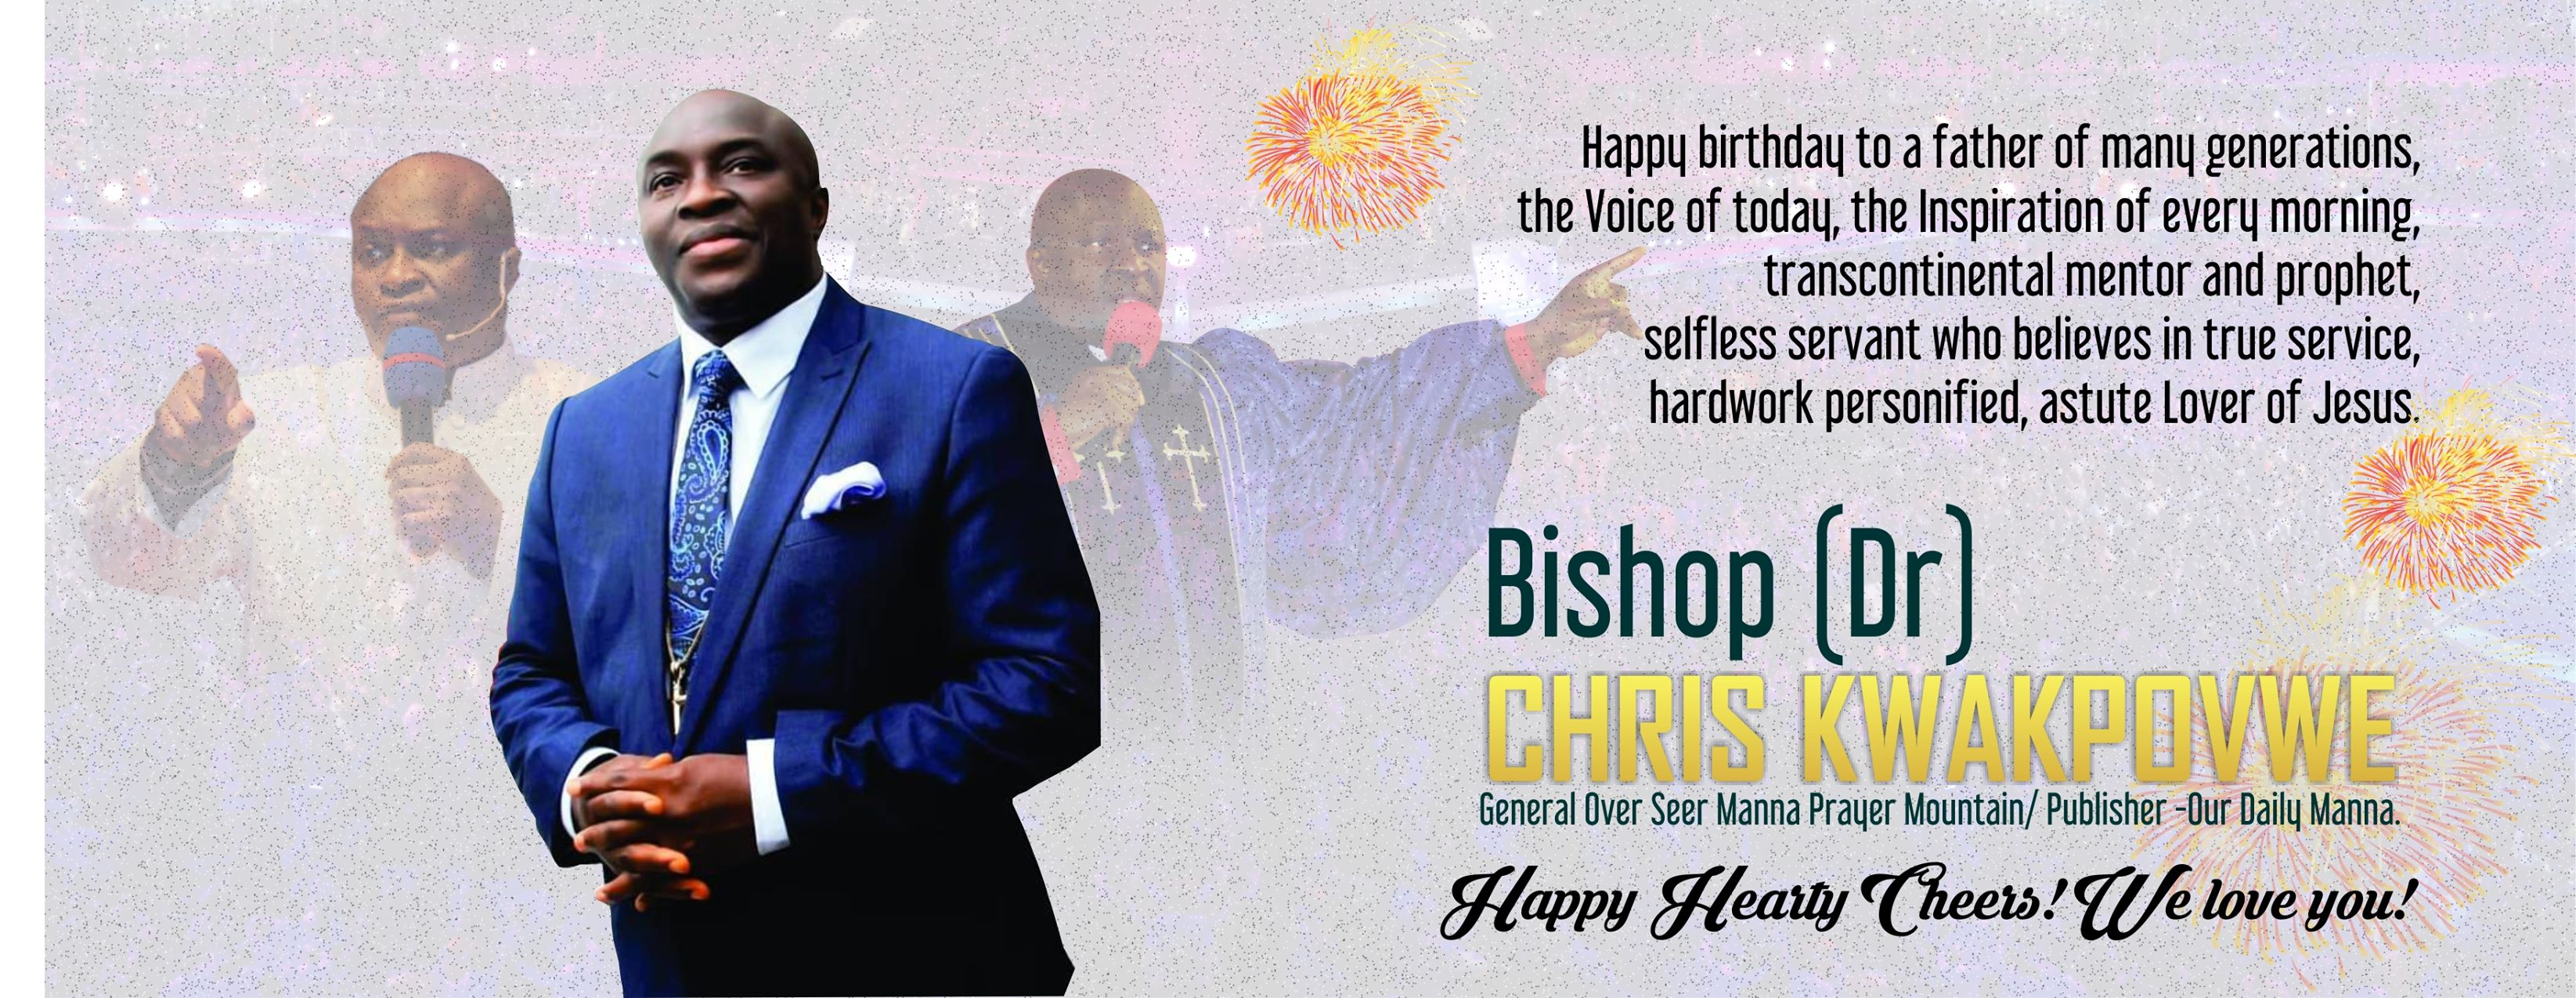 Happy birthday Bishop Dr Chris